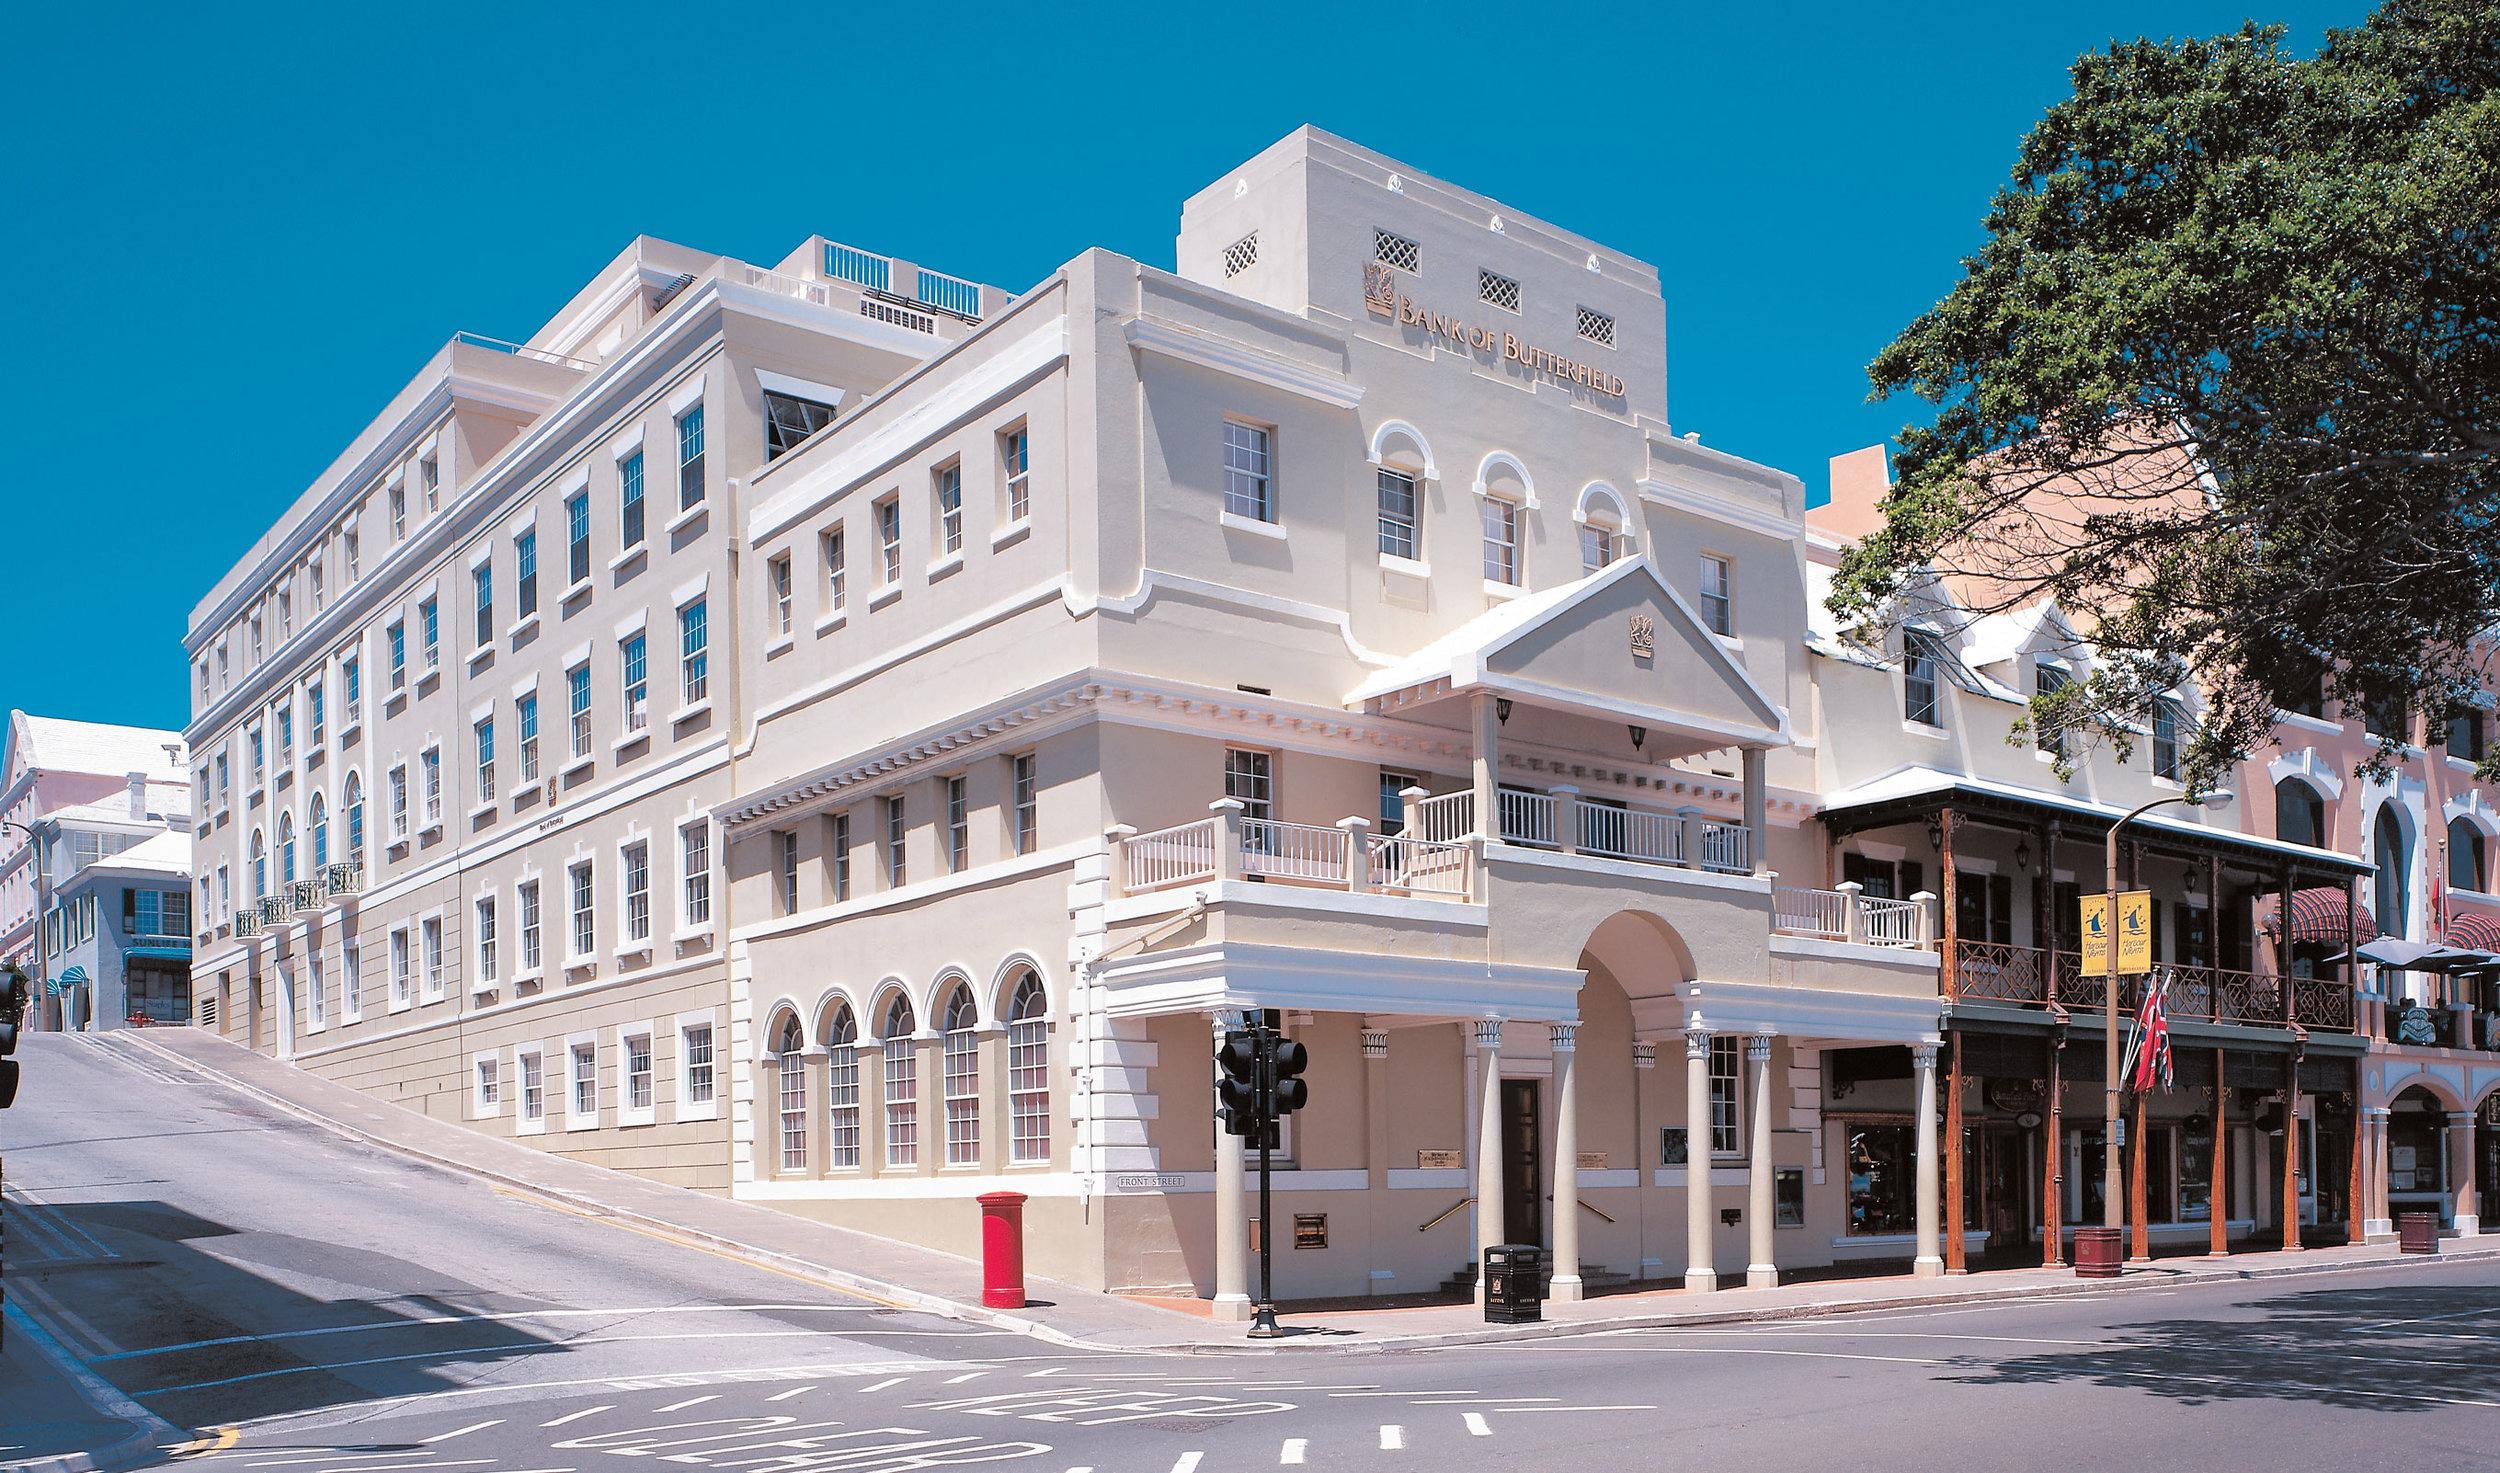 Head_Office_of_The_Bank_of_N.T._Butterfield_&_Son_Limited,_Hamilton,_Bermuda.jpg